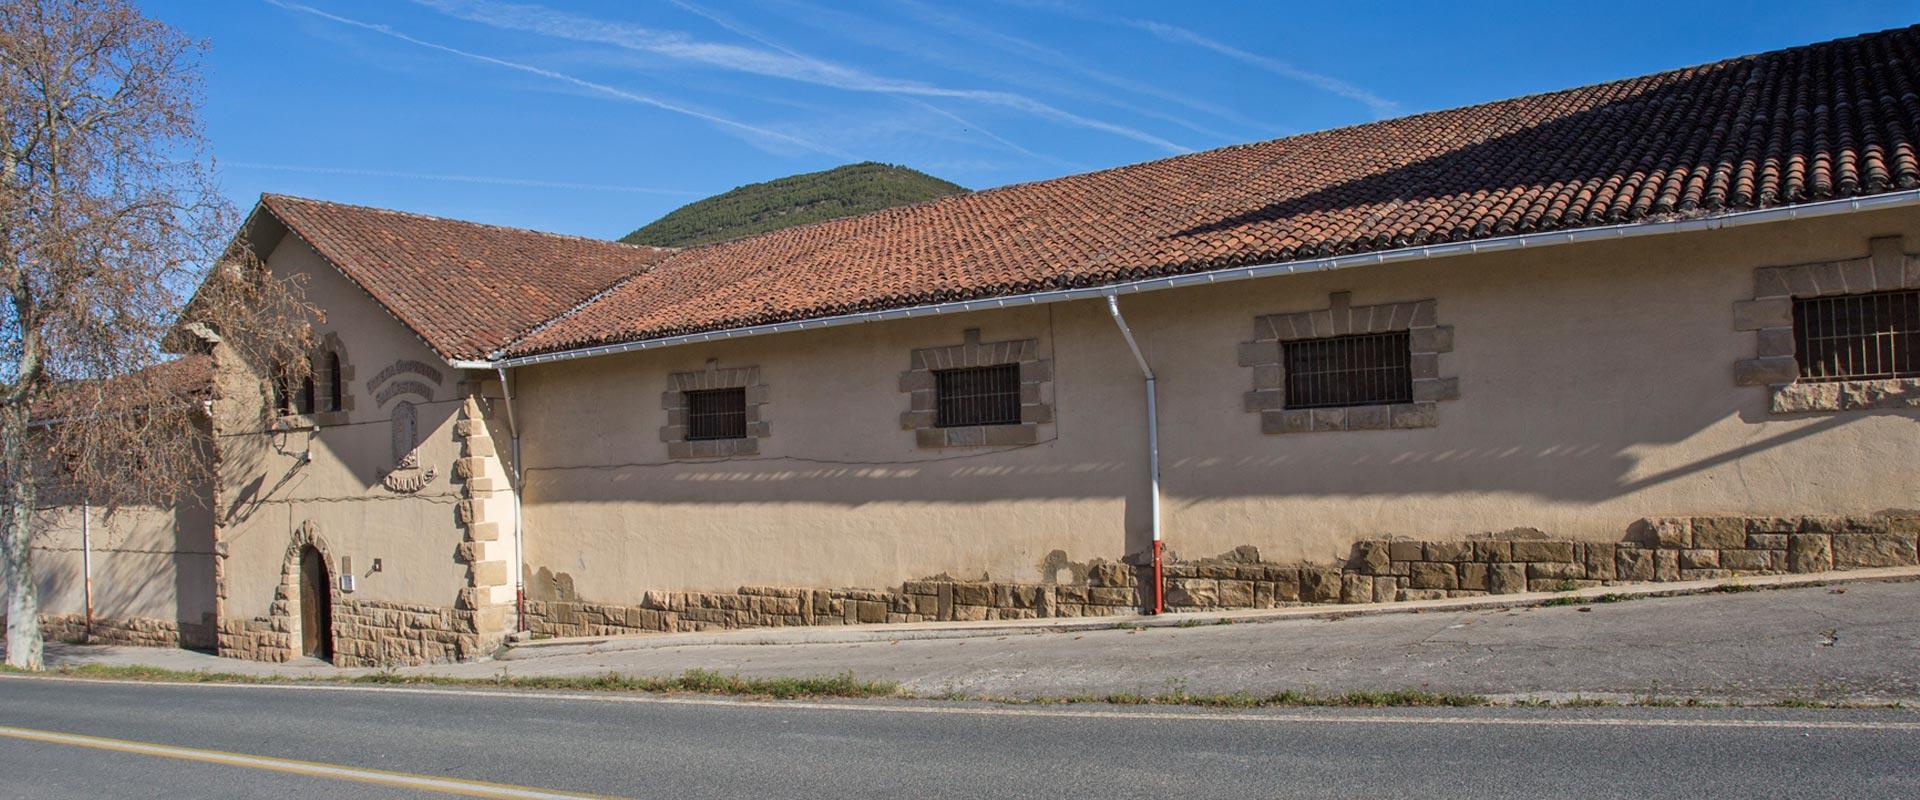 nuestra-historia07-bodegas-san-cristobal-tinto-rosado-navarra-cirauqui